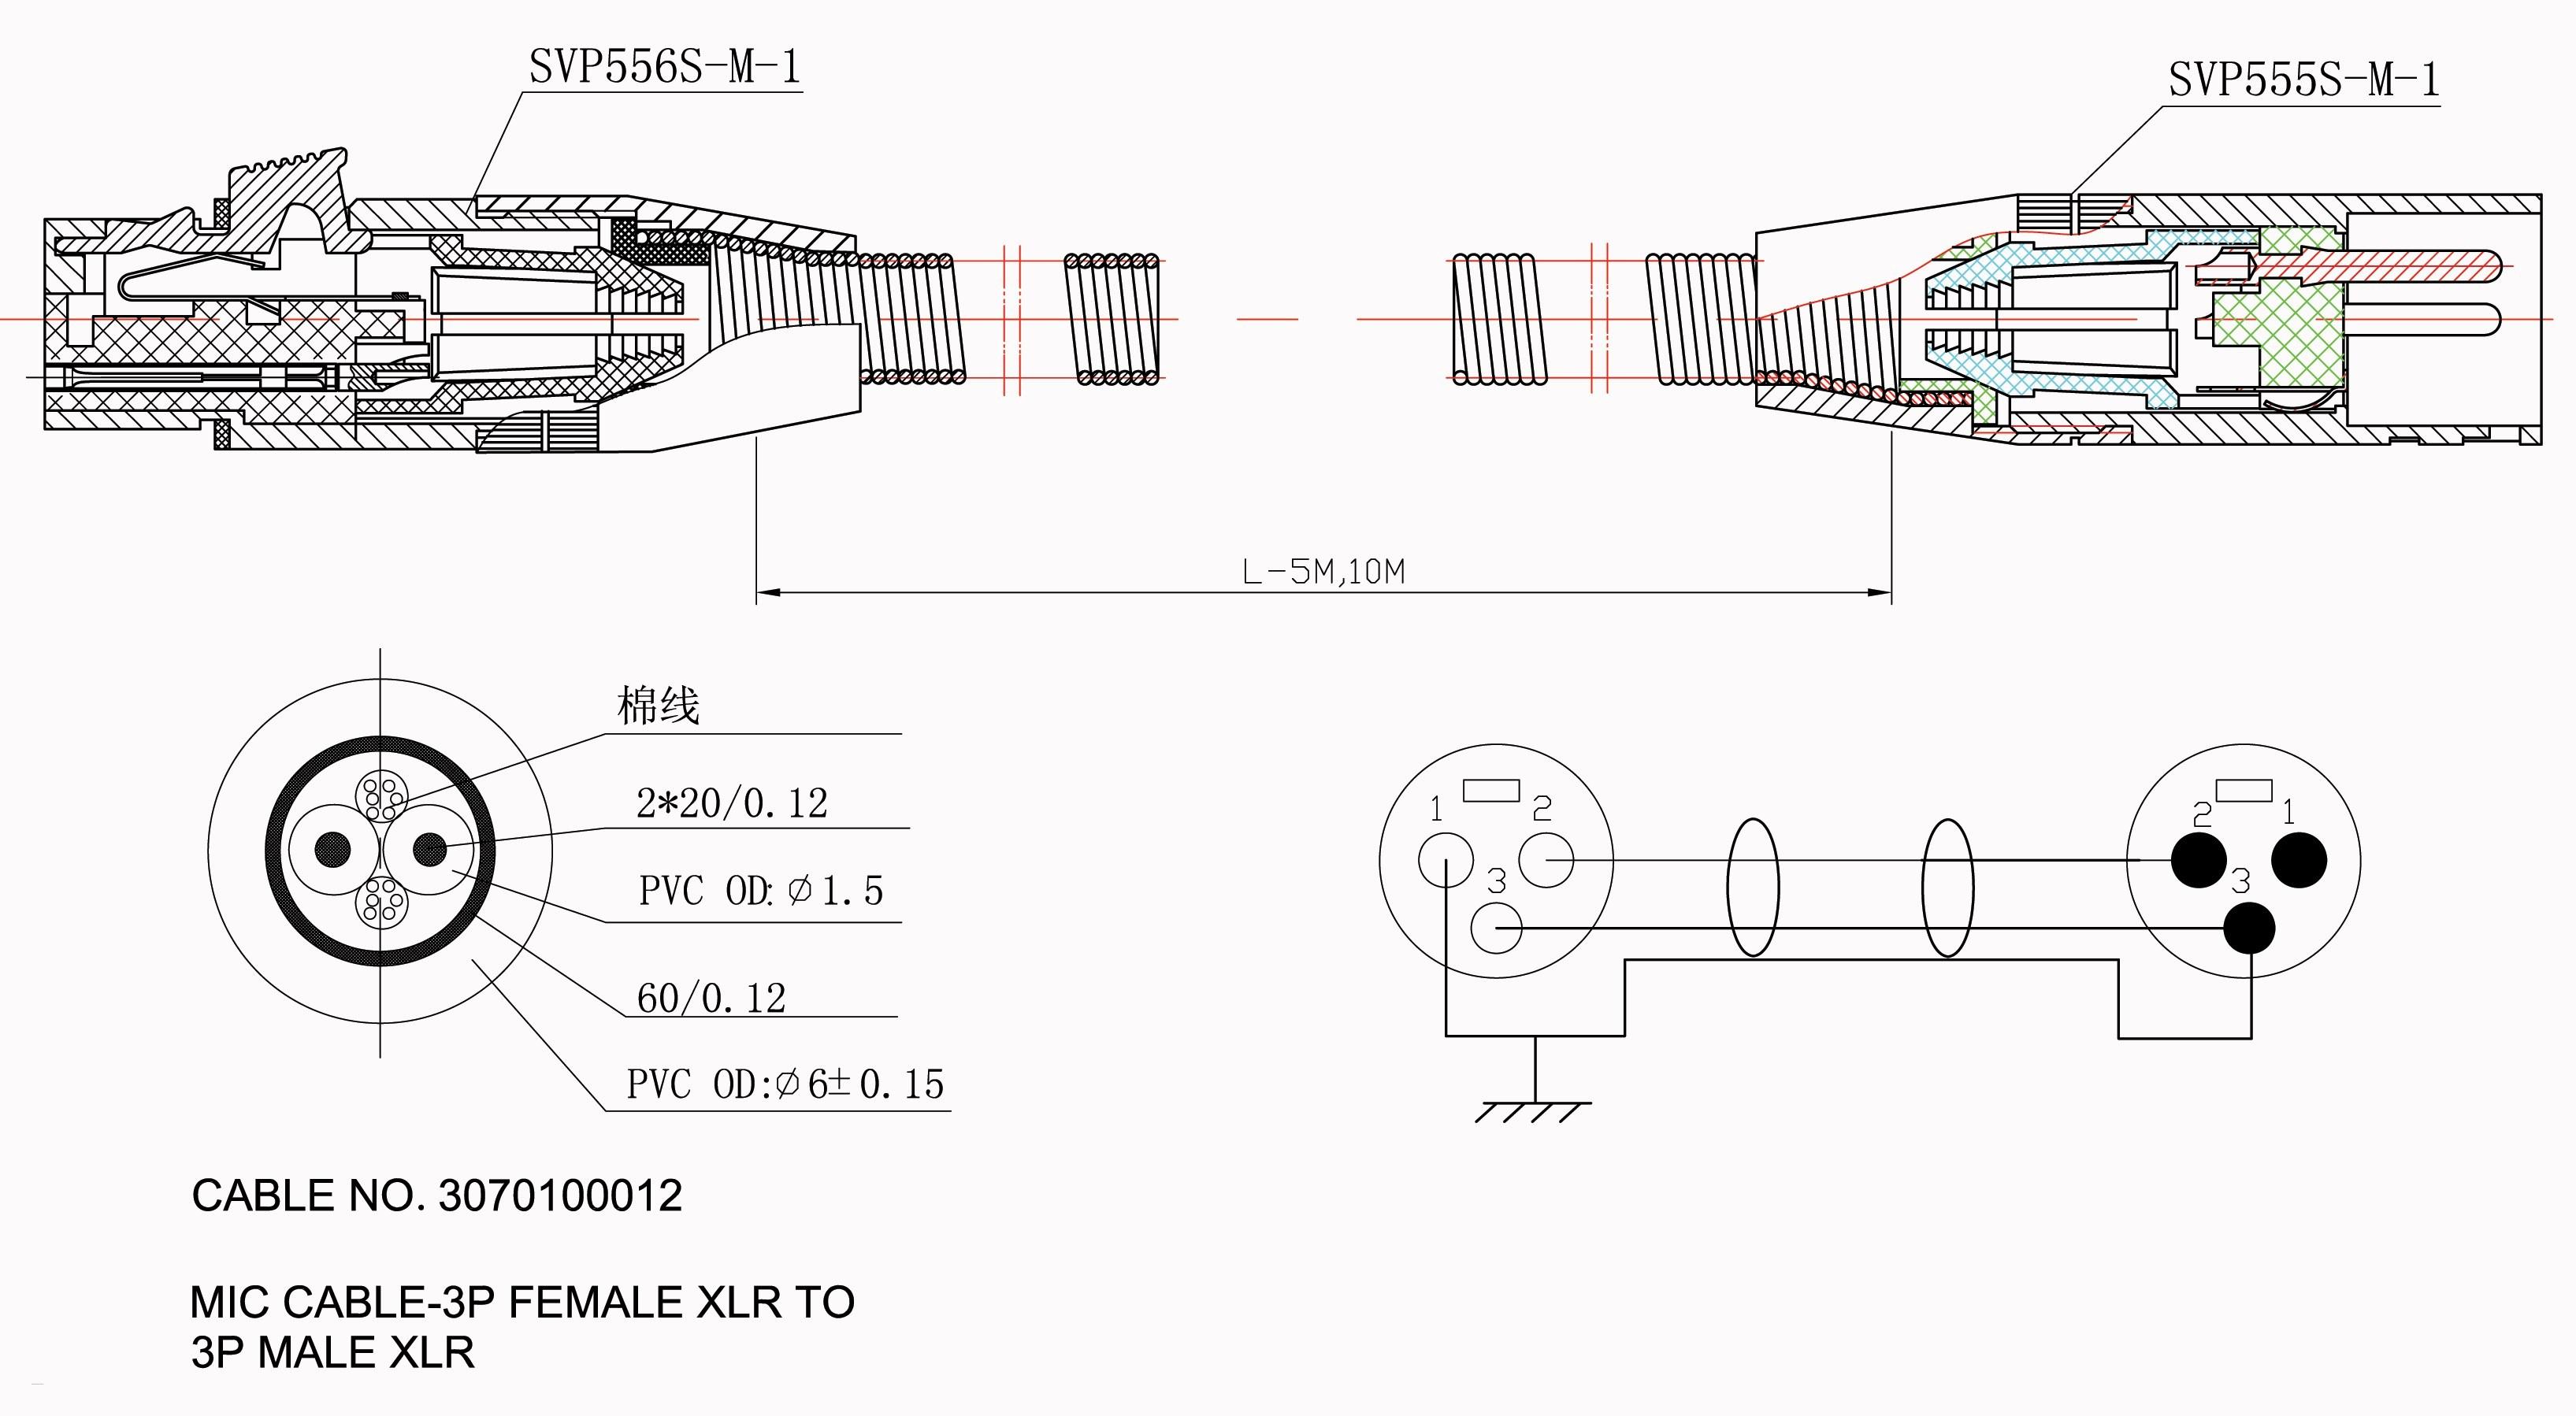 cat 3 wiring diagram rj11 kicker l7 subwoofer dmx control 19 stromoeko de sgo vipie u2022 rh cable pin a wire